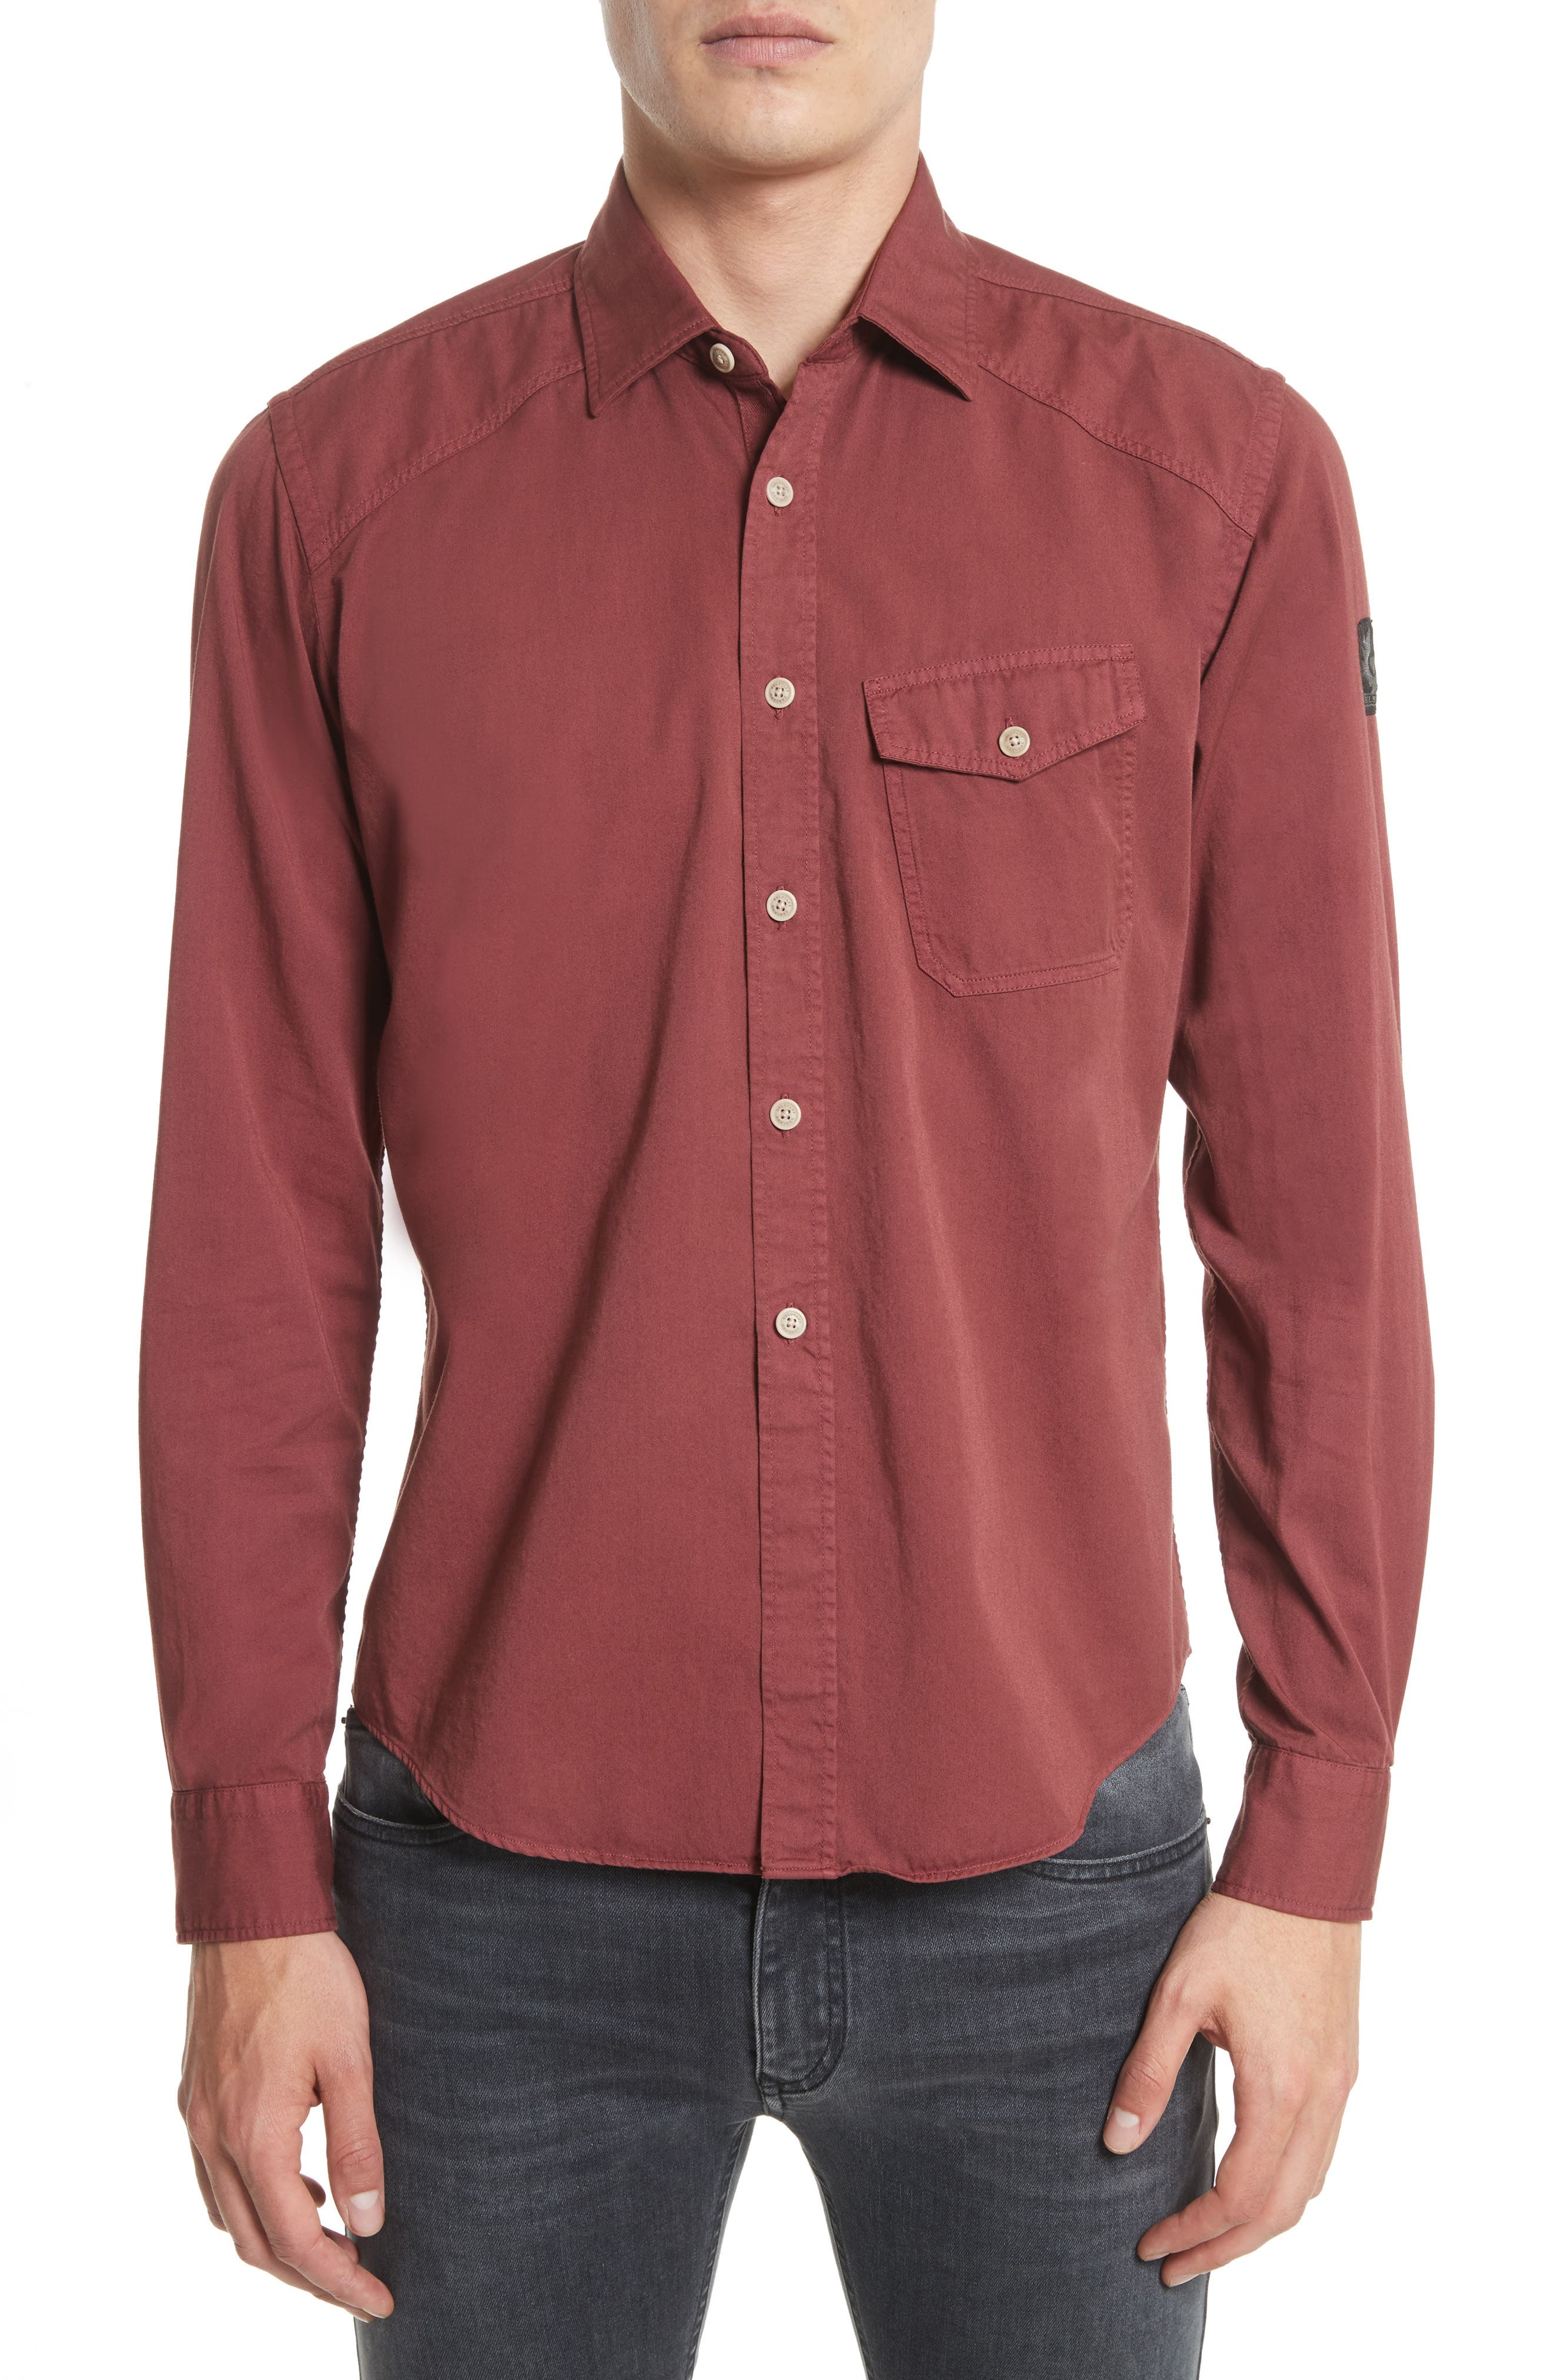 Main Image - Belstaff Steadway Extra Slim Fit Sport Shirt